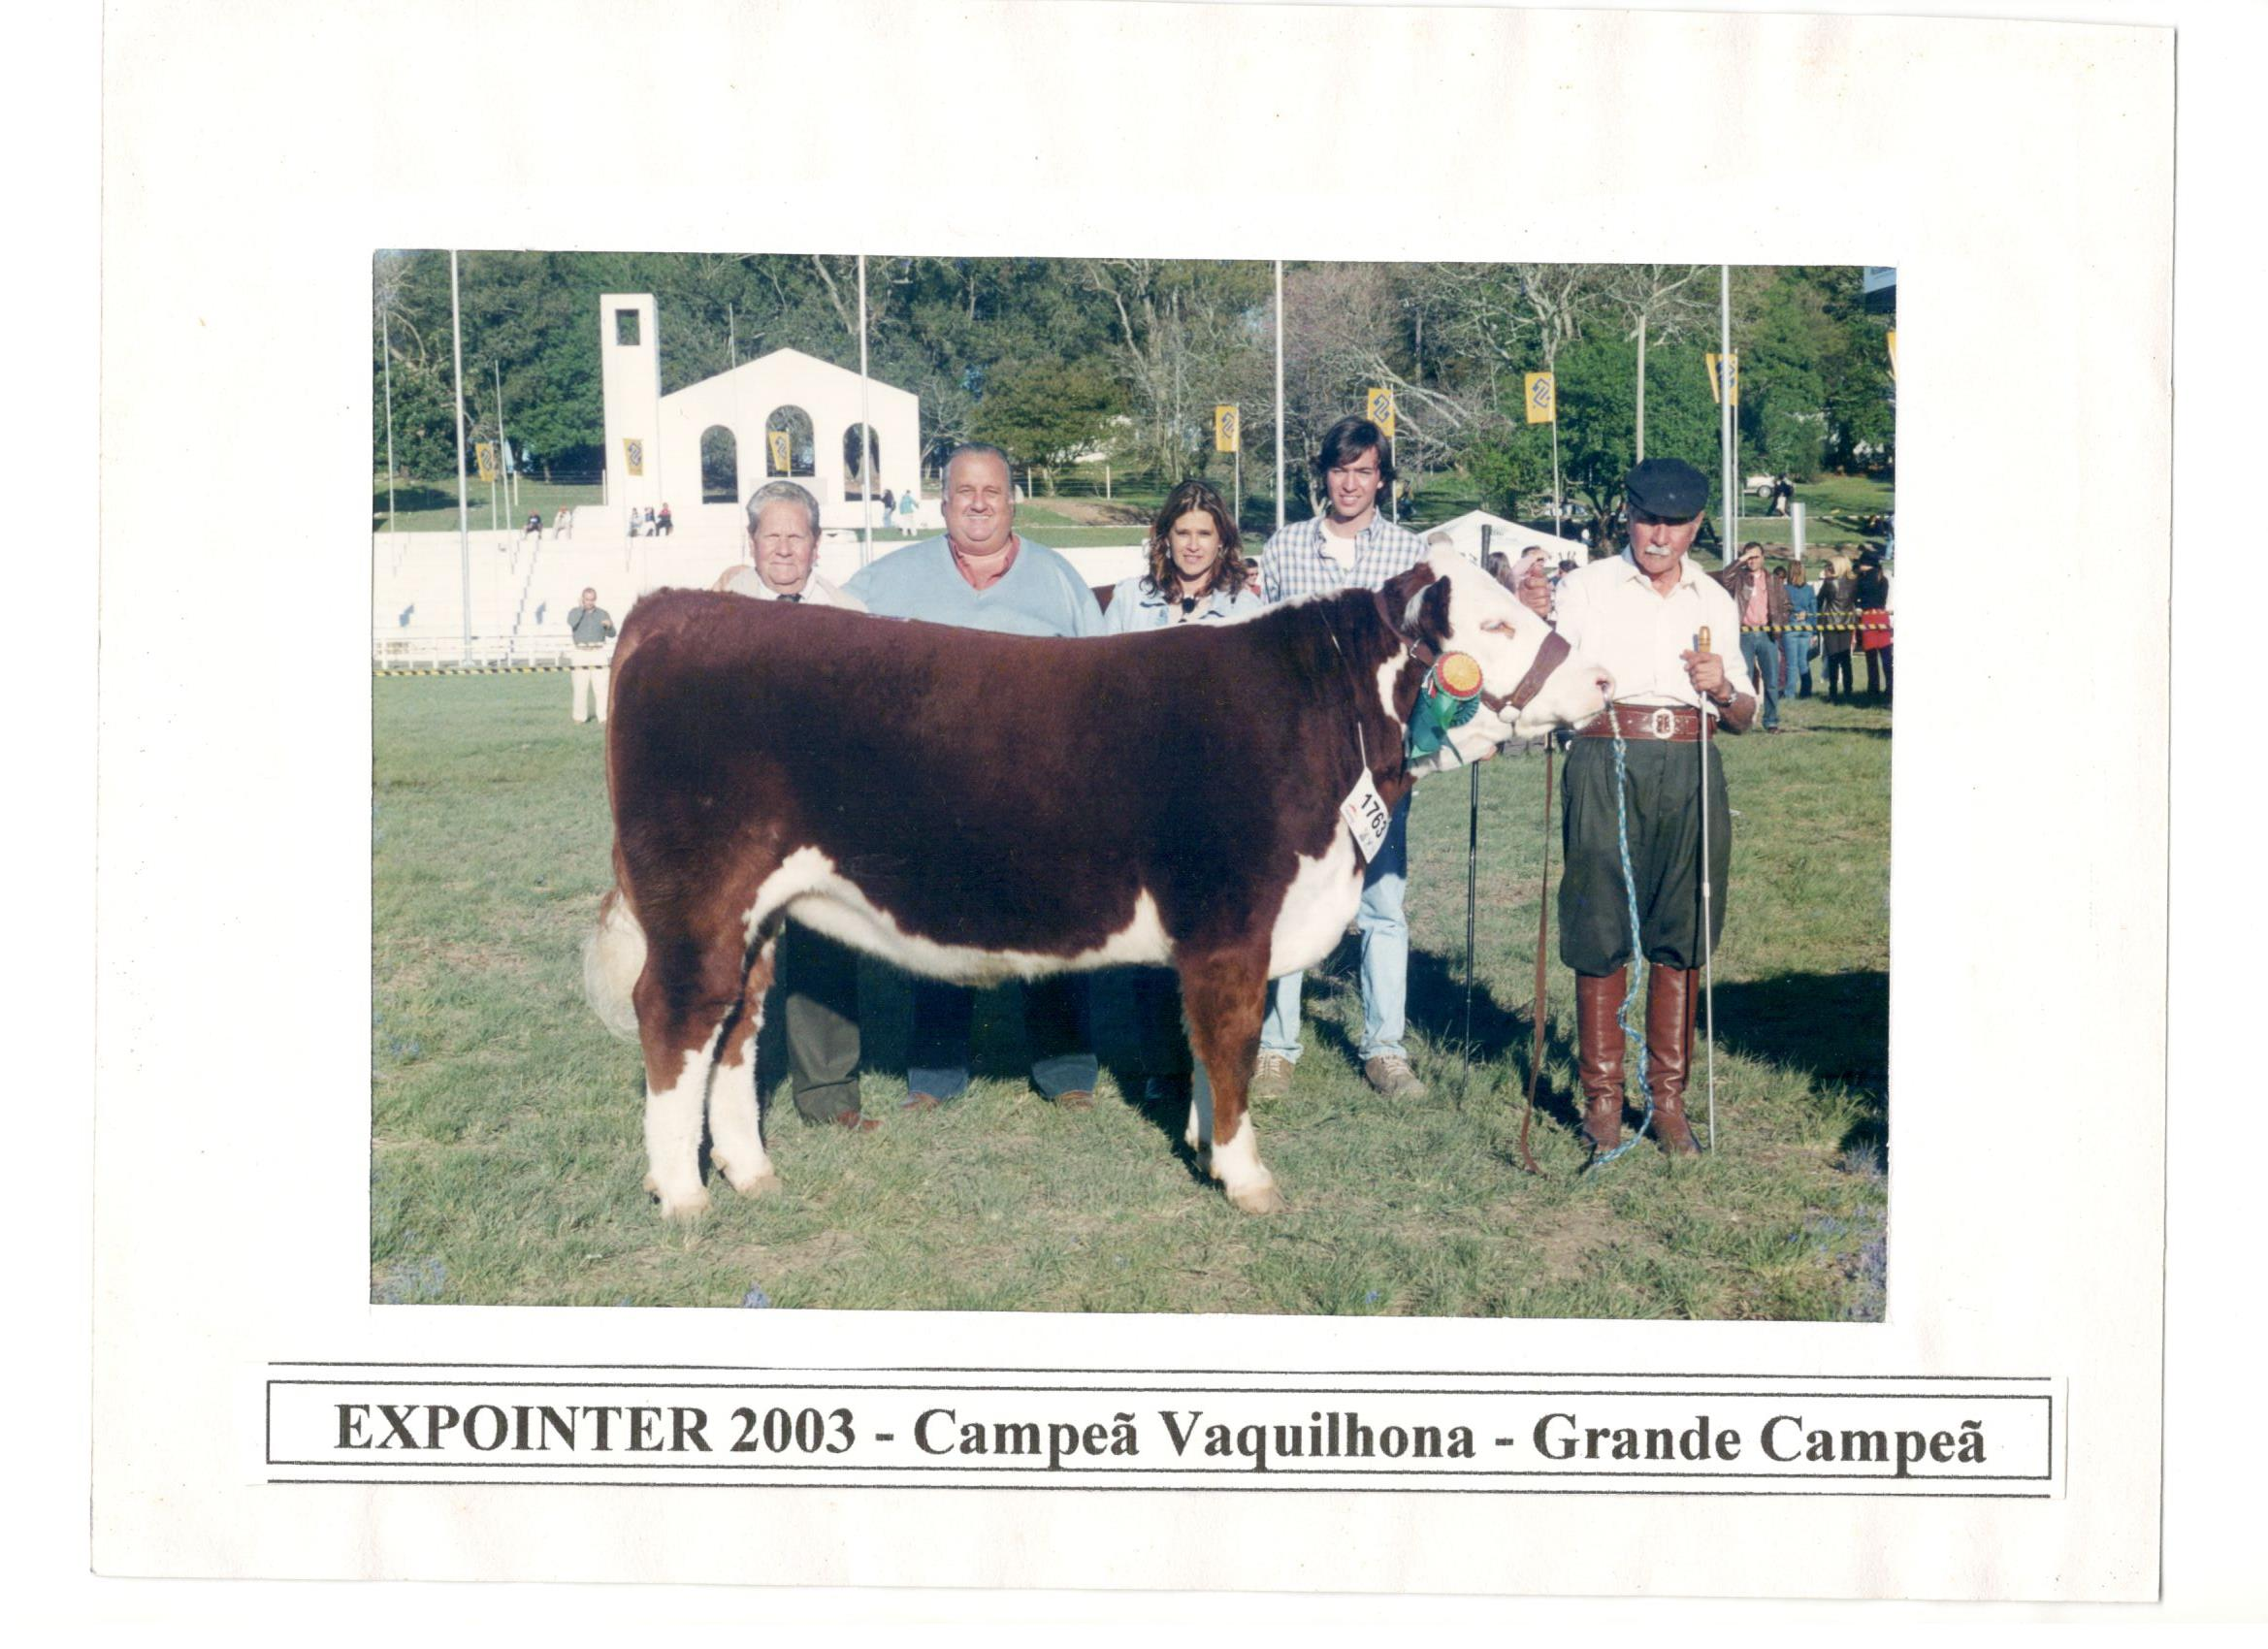 EXPOINTER_2003_-_CAMPEÃ_VAQUILHONA_-_GRANDE_CAMPEÃ